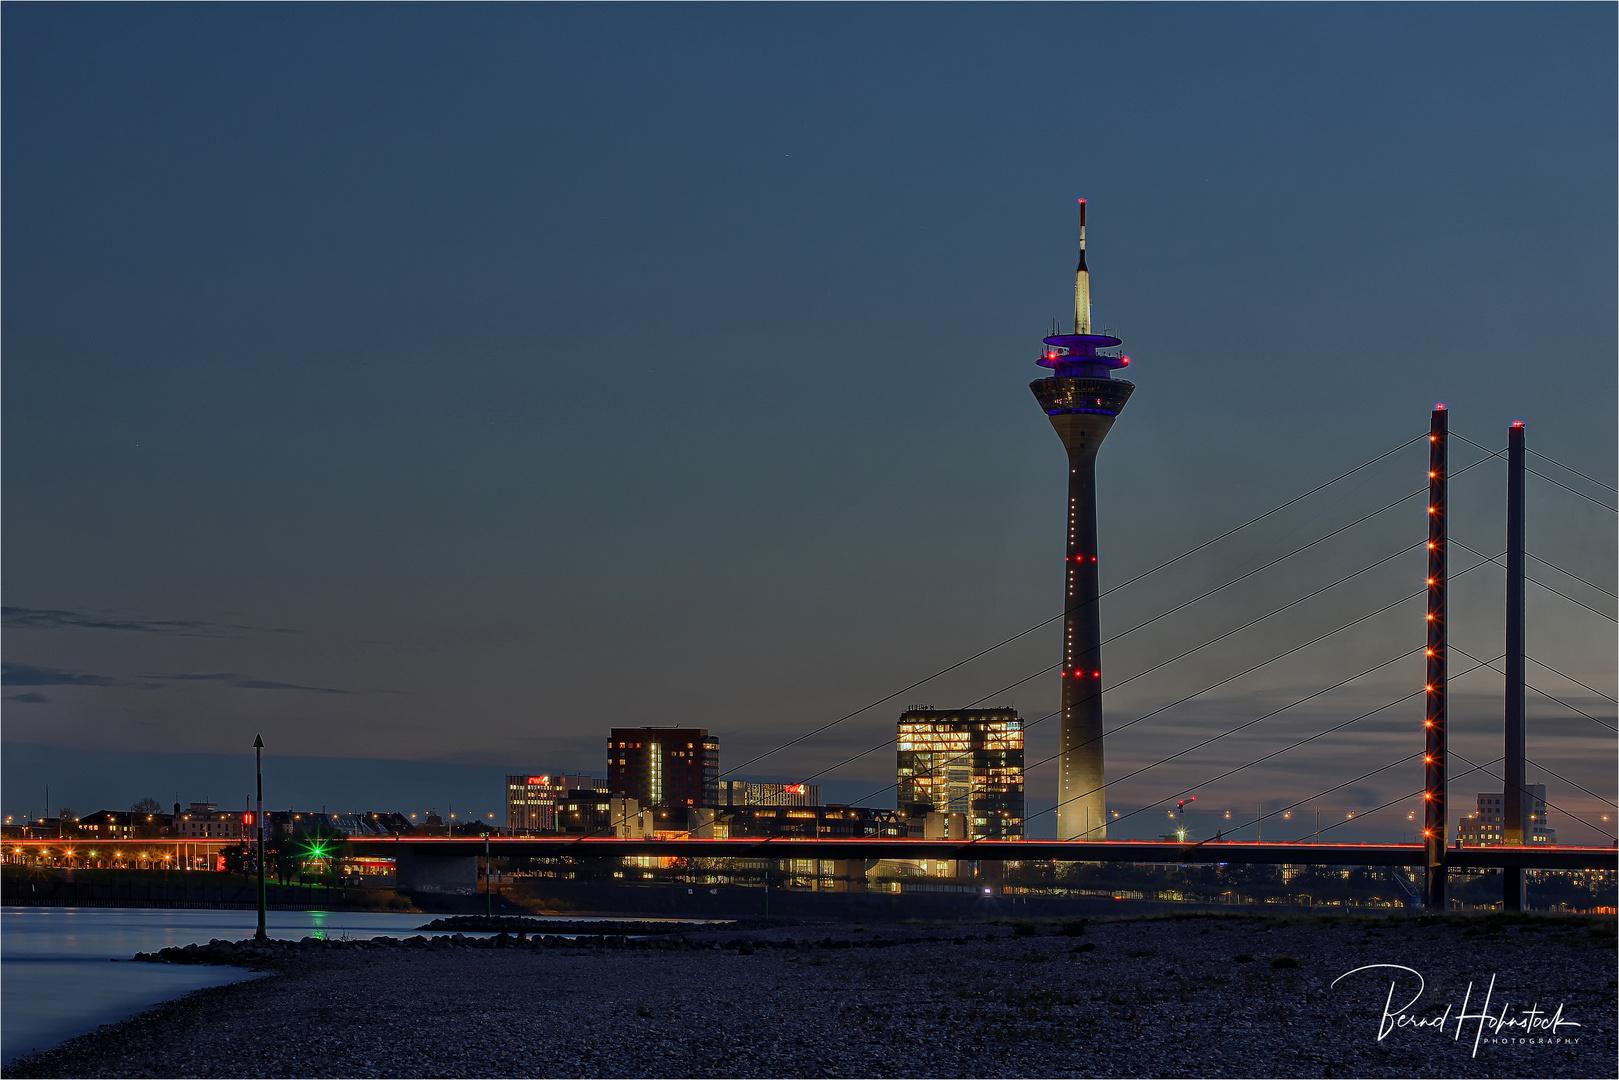 Rheinturm Düsseldorf ...